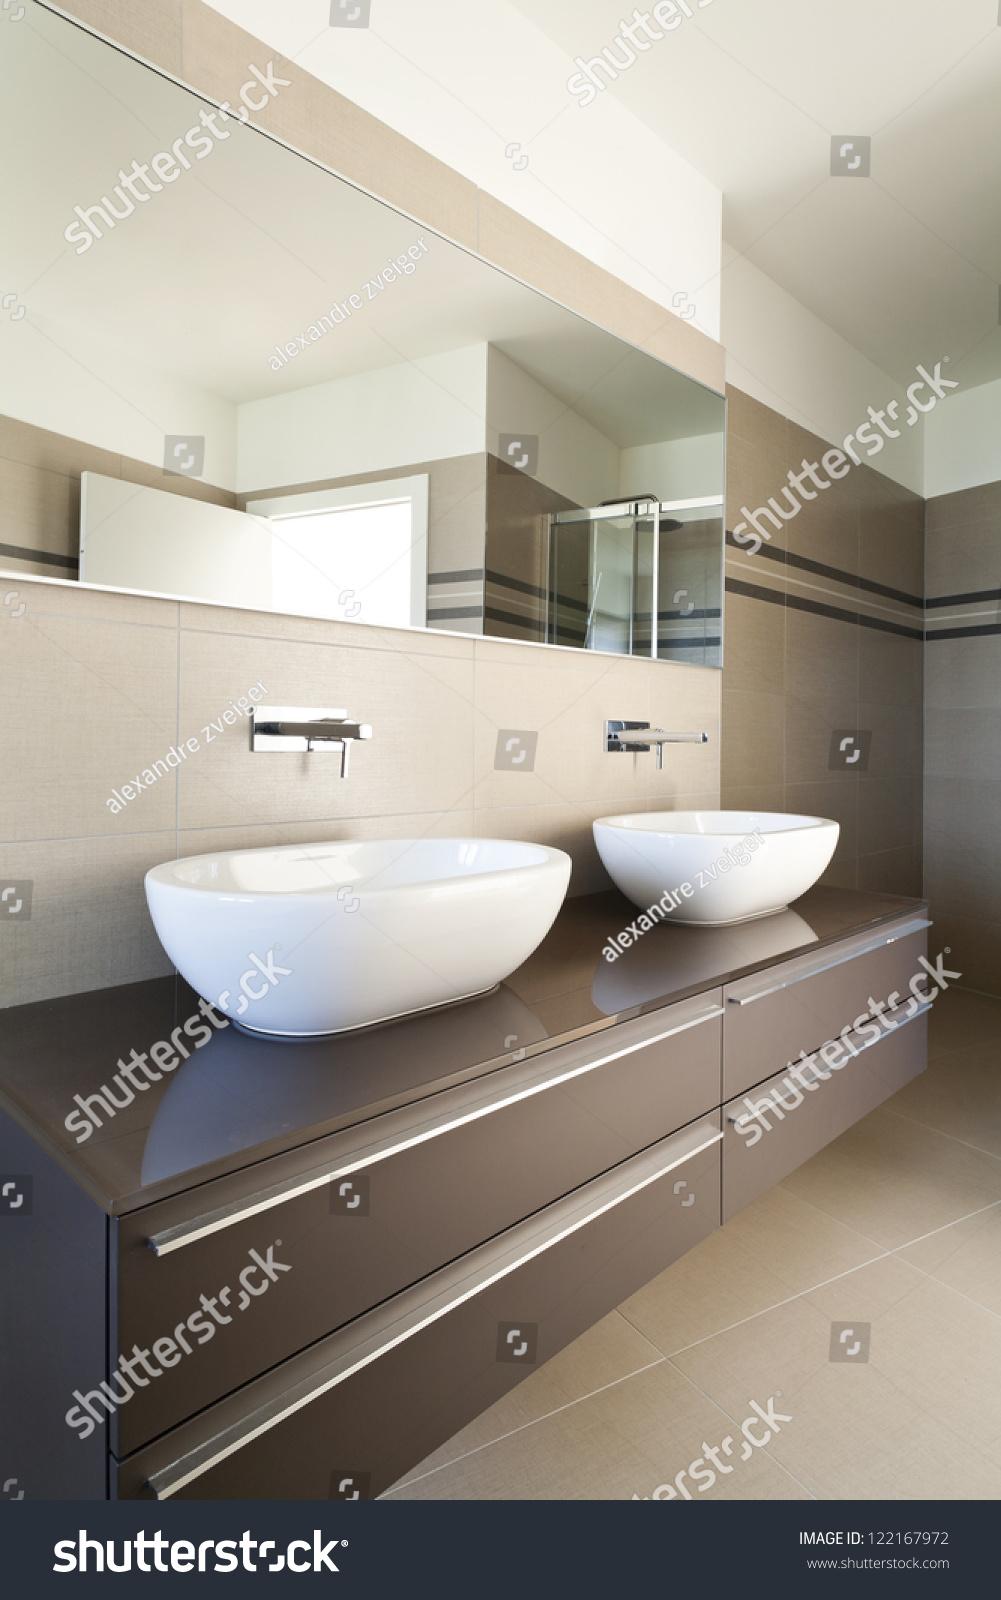 Modern Architecture New Empty Apartment Bathroom Stock Photo 122167972  Shutterstock